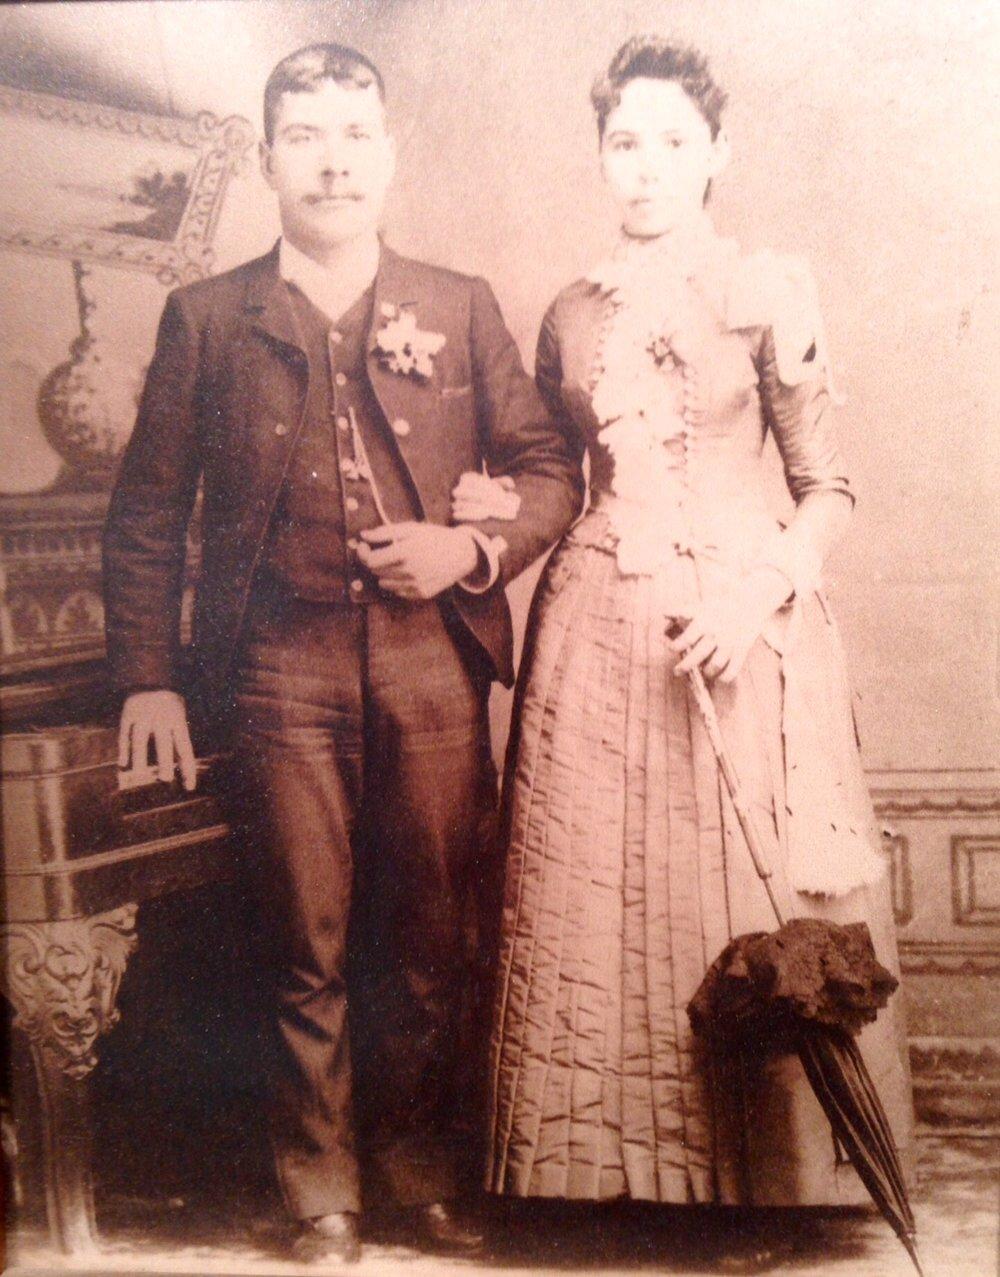 Joseph Letourneau and Elizabeth Jane Wasley, wedding photo, 1 Jul 1889                 Maternal great-great grandparents